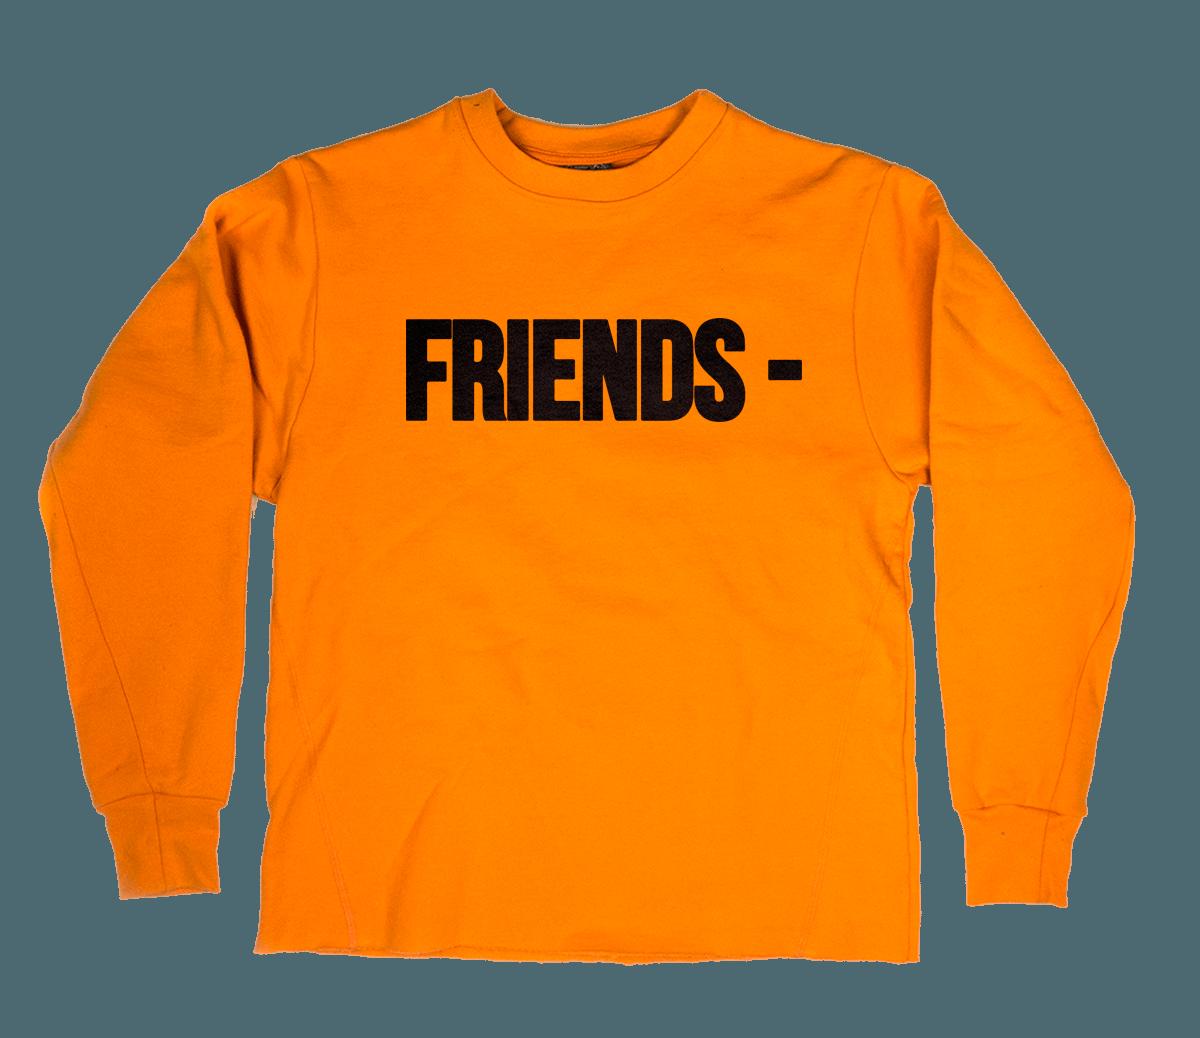 Vlone Friends Orange Crewneck SS17 Collection Now